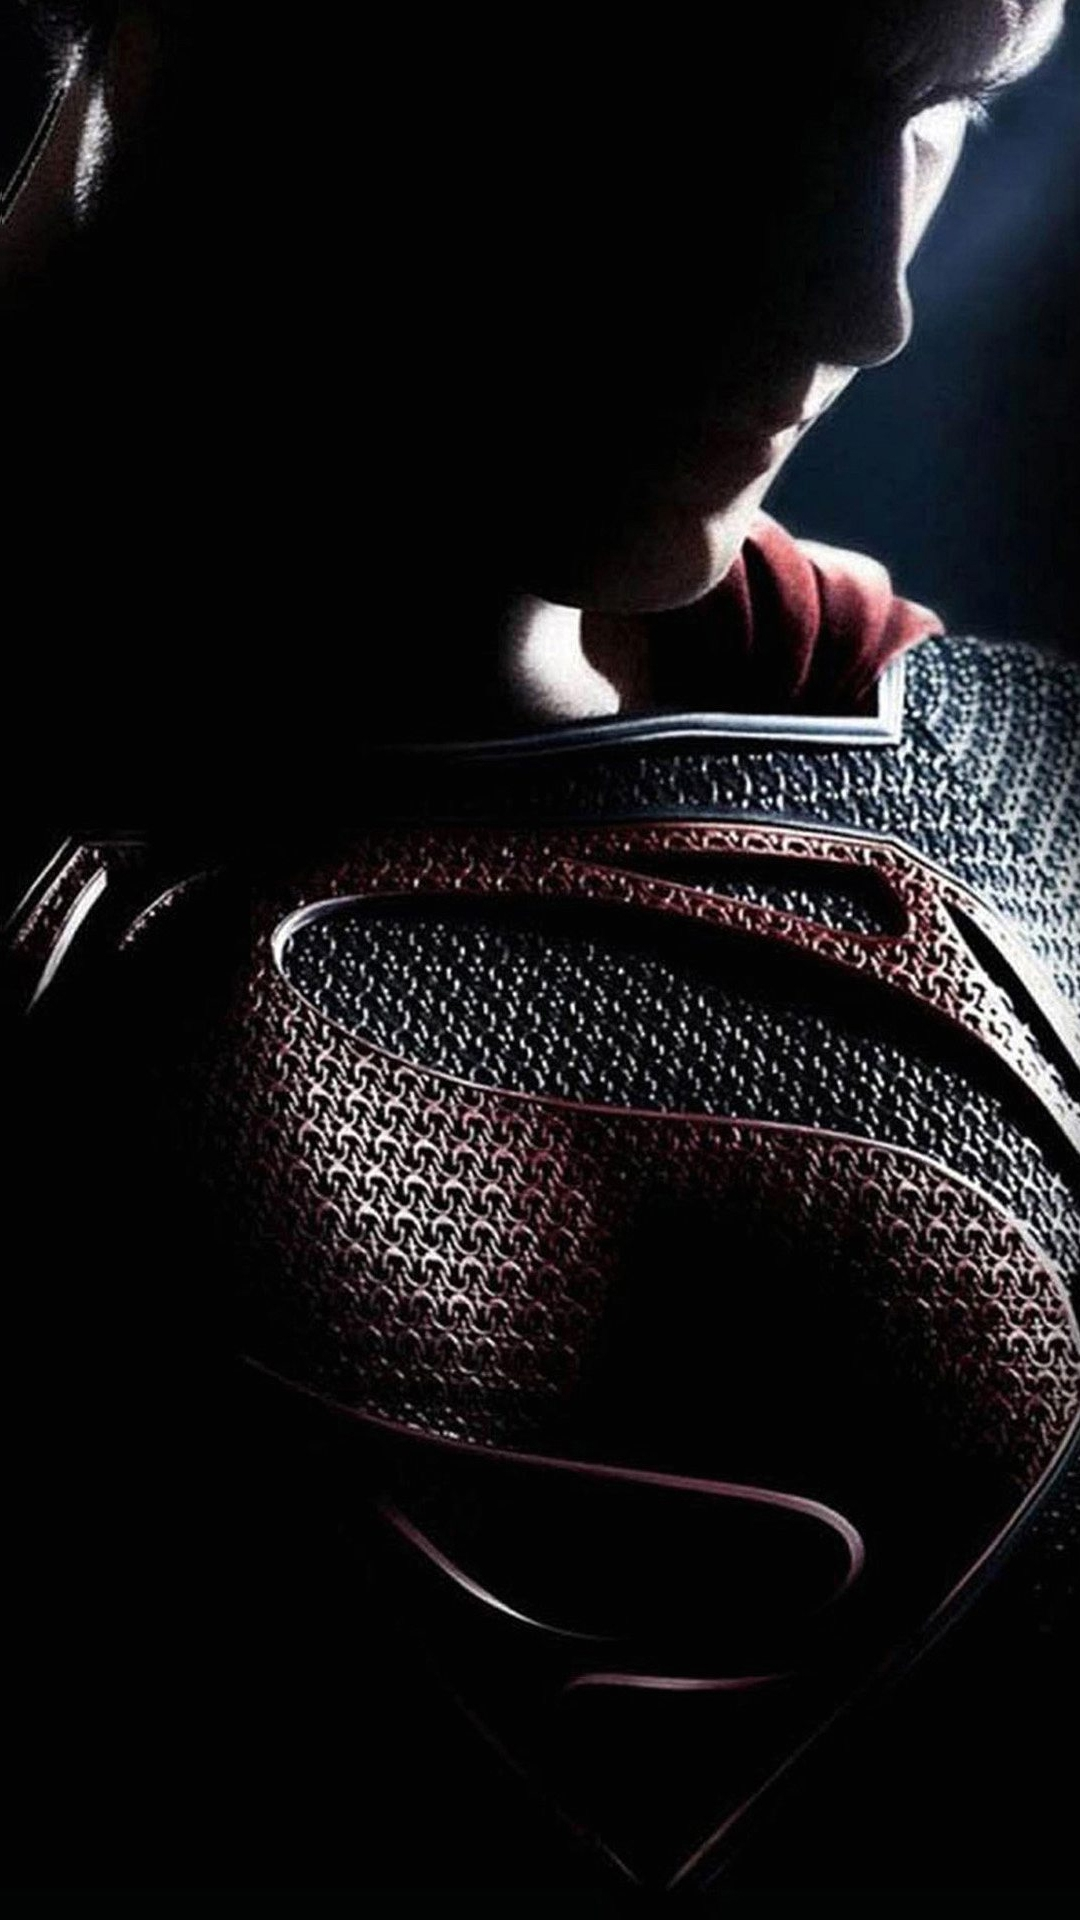 superman hd moto g phone wallpaper | best games wallpapers